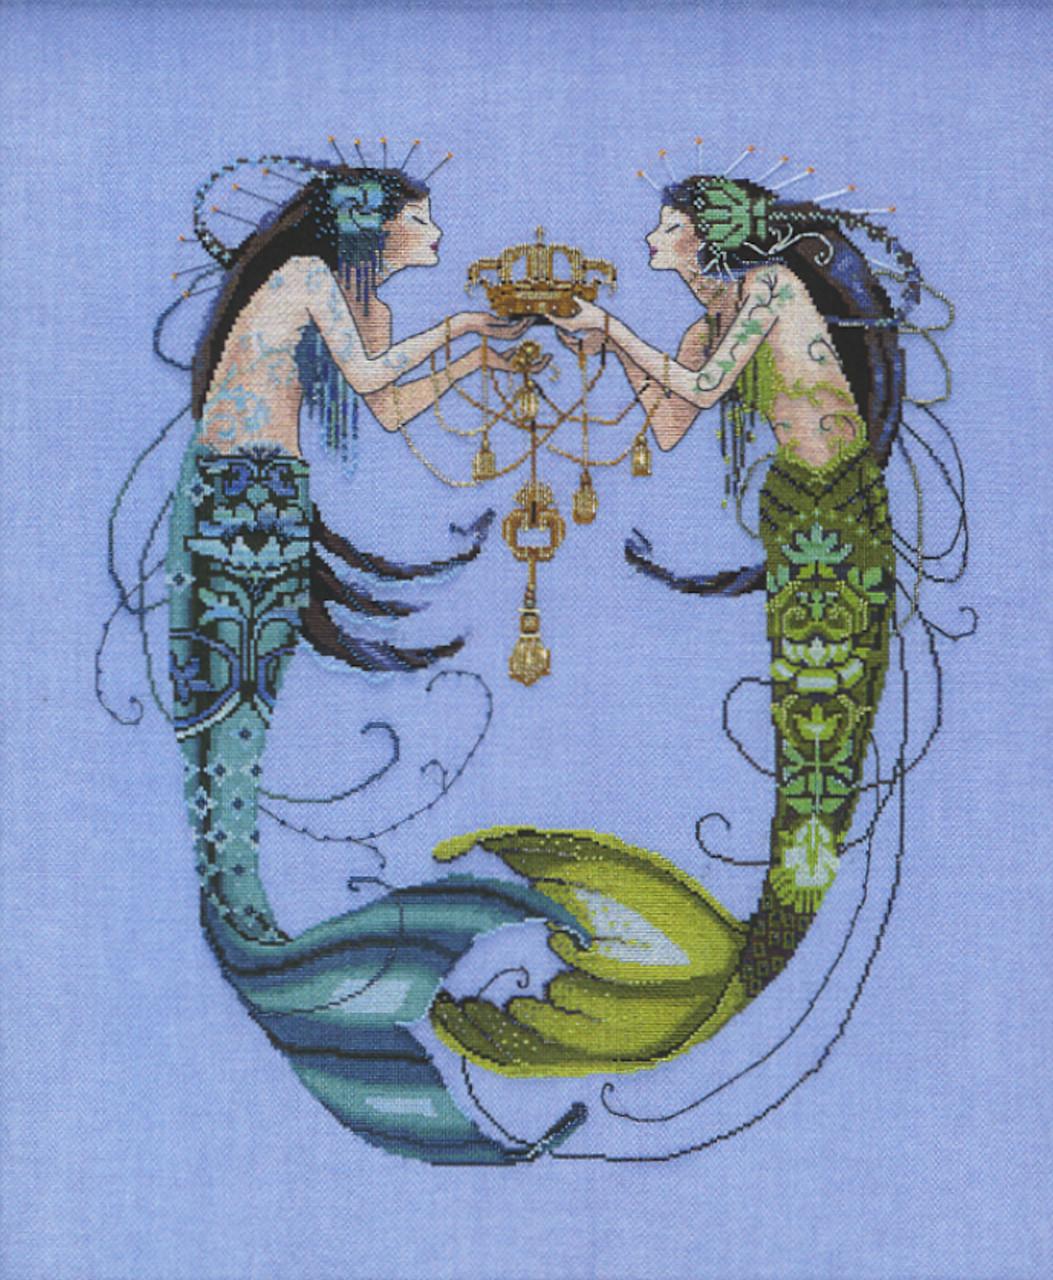 Mirabilia Embellishment Pack - The Twin Mermaids